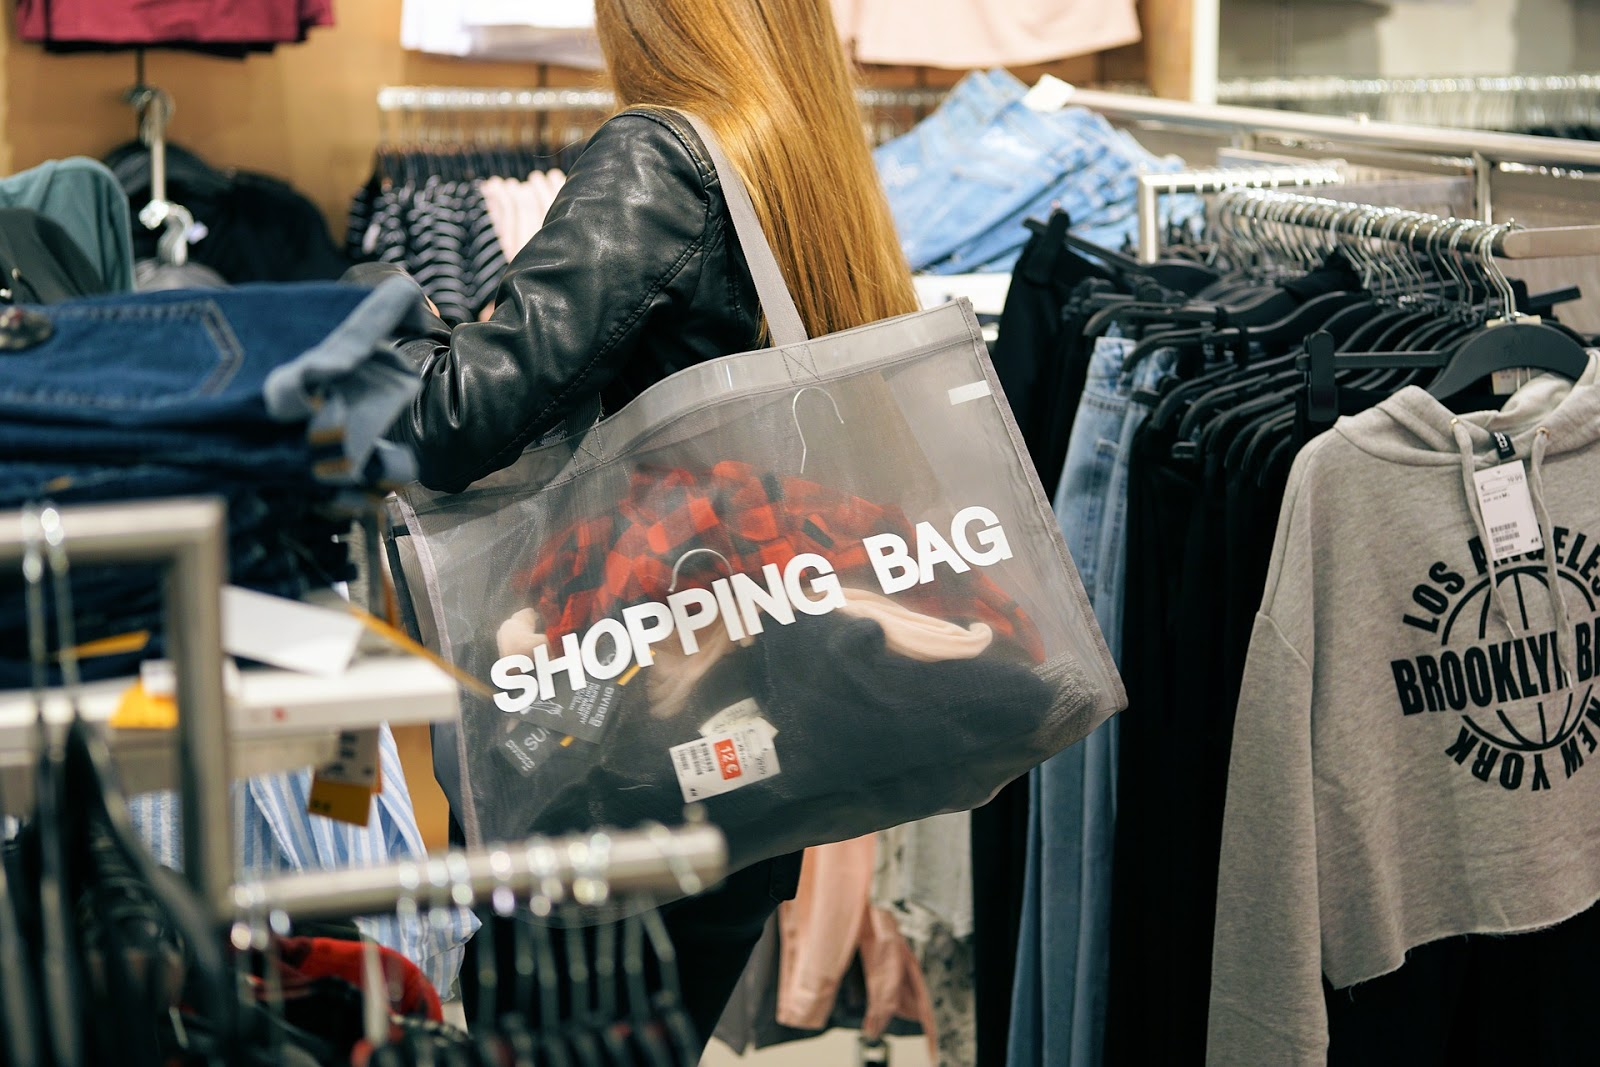 Shopping bag - Image credit: pixabay.com